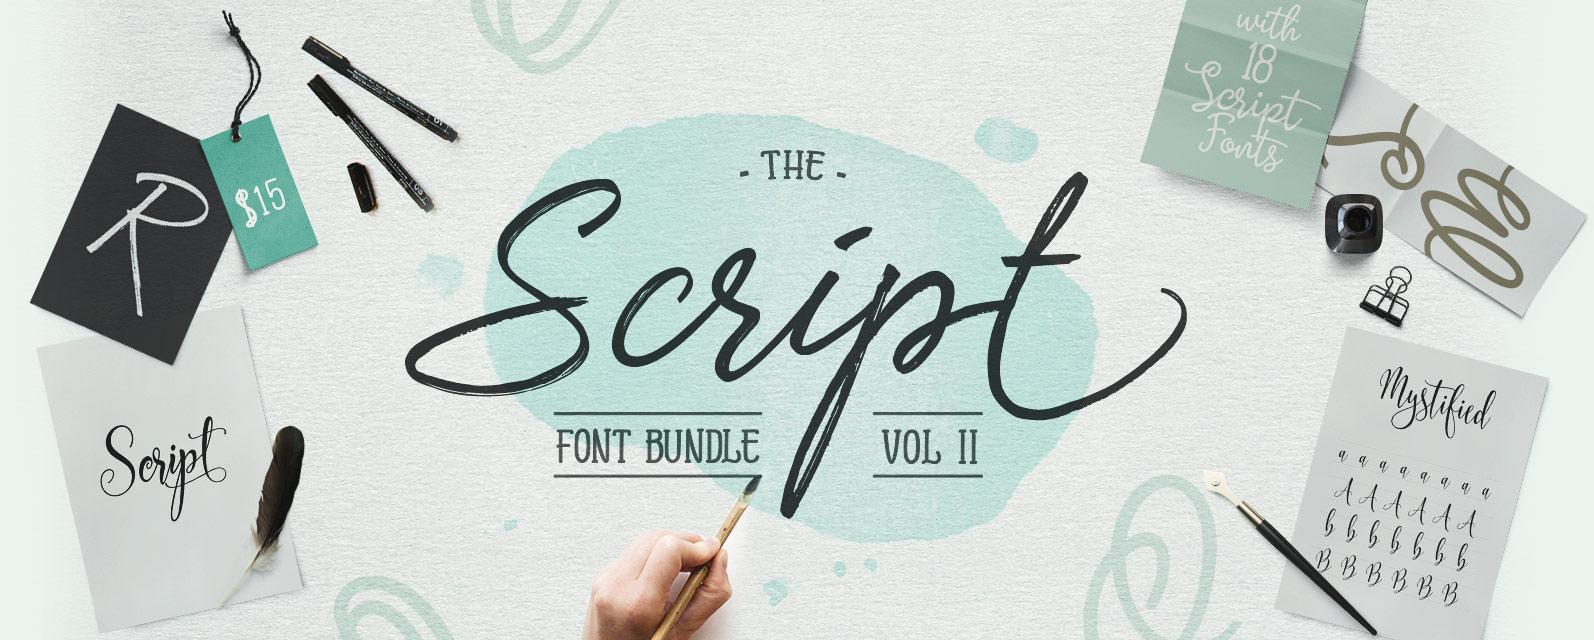 The-Script-Font-Bundle-Vol2-Main-Cover.jpg